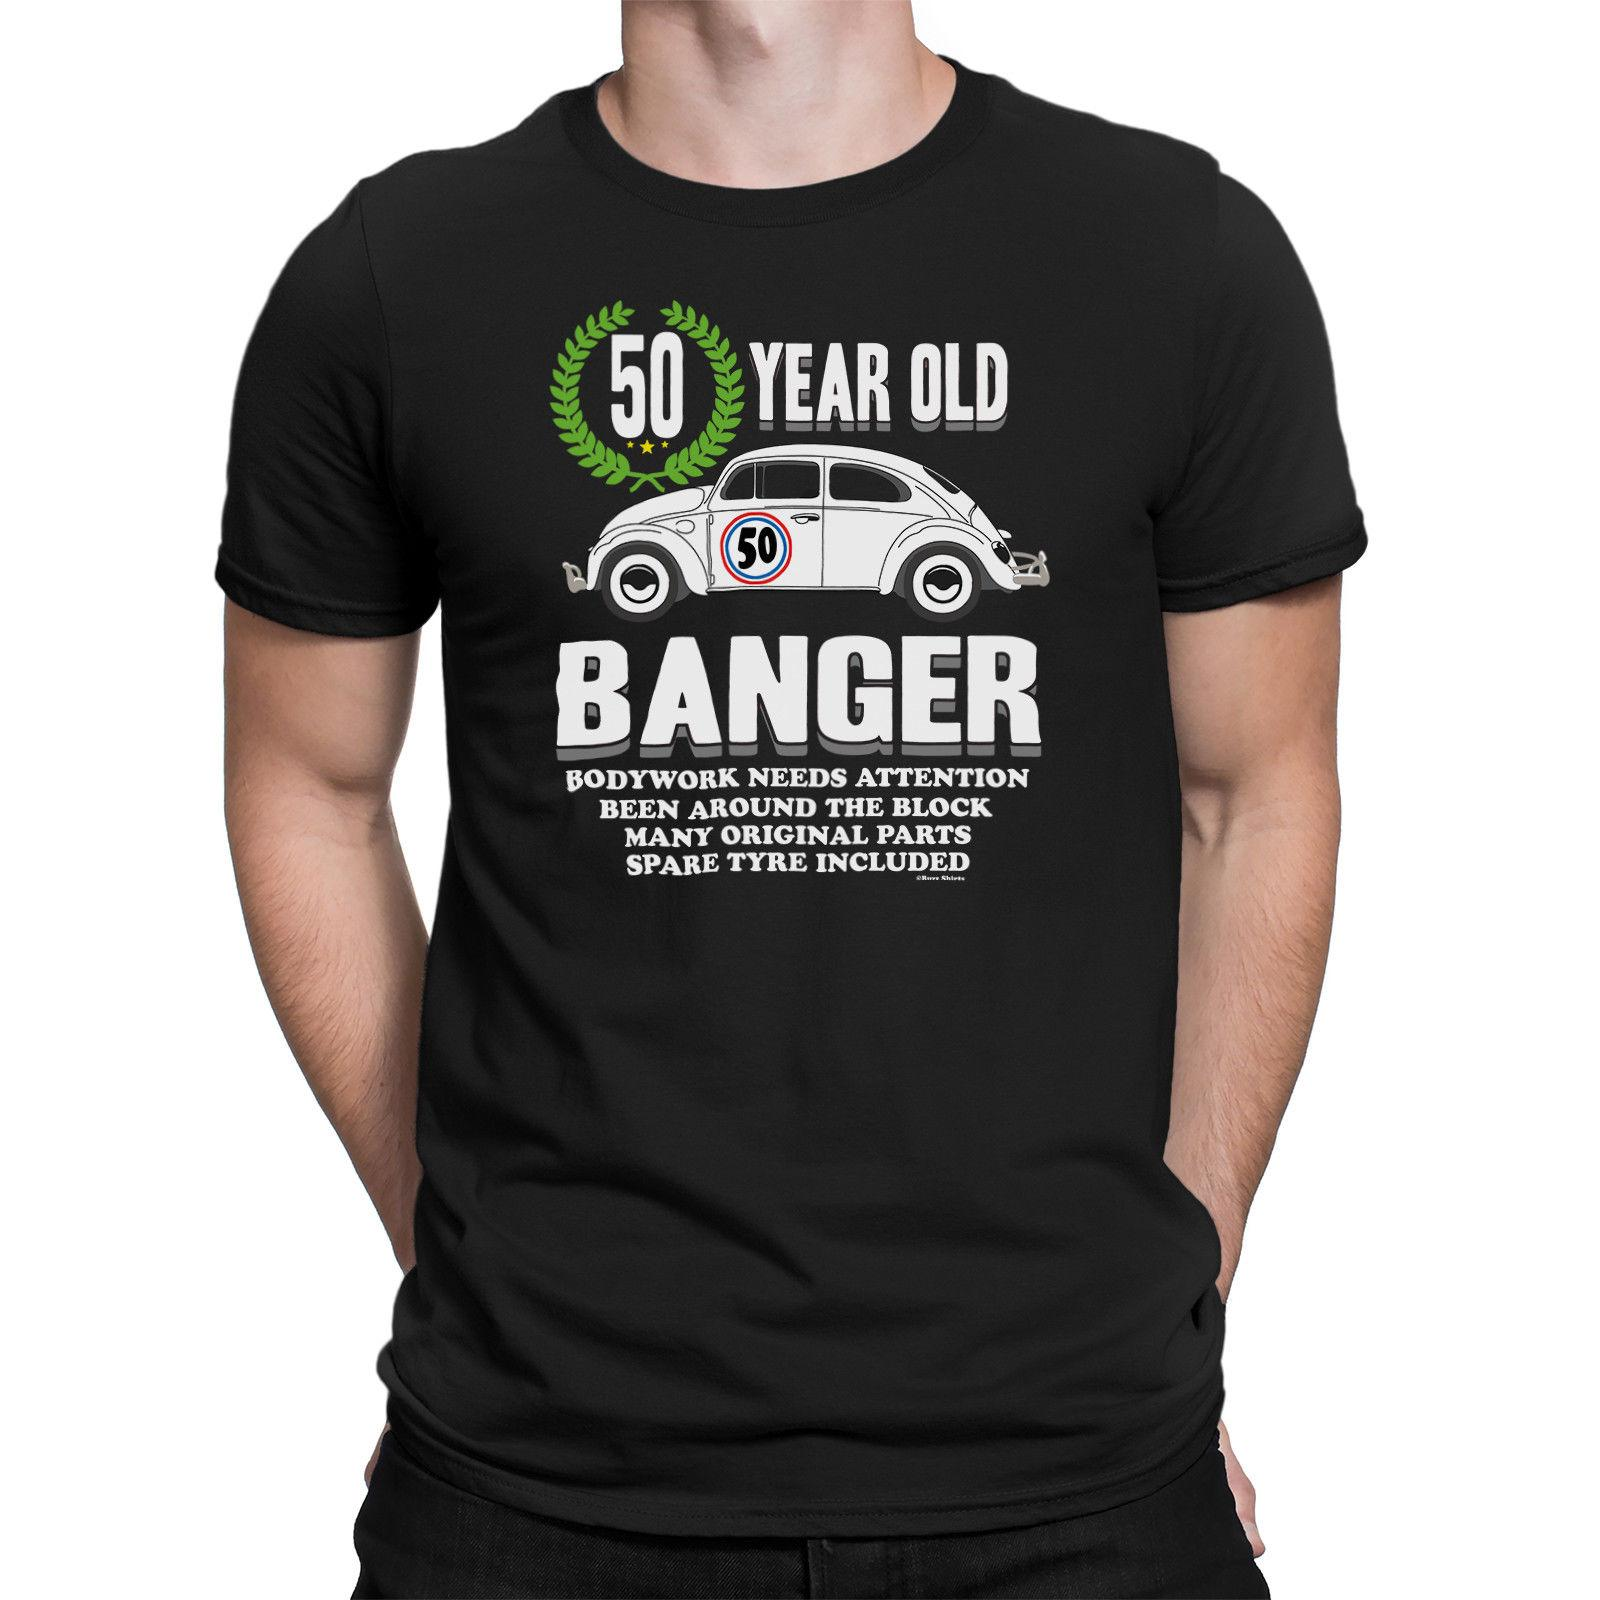 Mens 50th BIRTHDAY TShirt OLD BANGER 50 Years Old Joke Gift Fifty Print Short Sleeve Men Top Novelty T Shirts MenS Brand Clothing Tna Humorous Tee